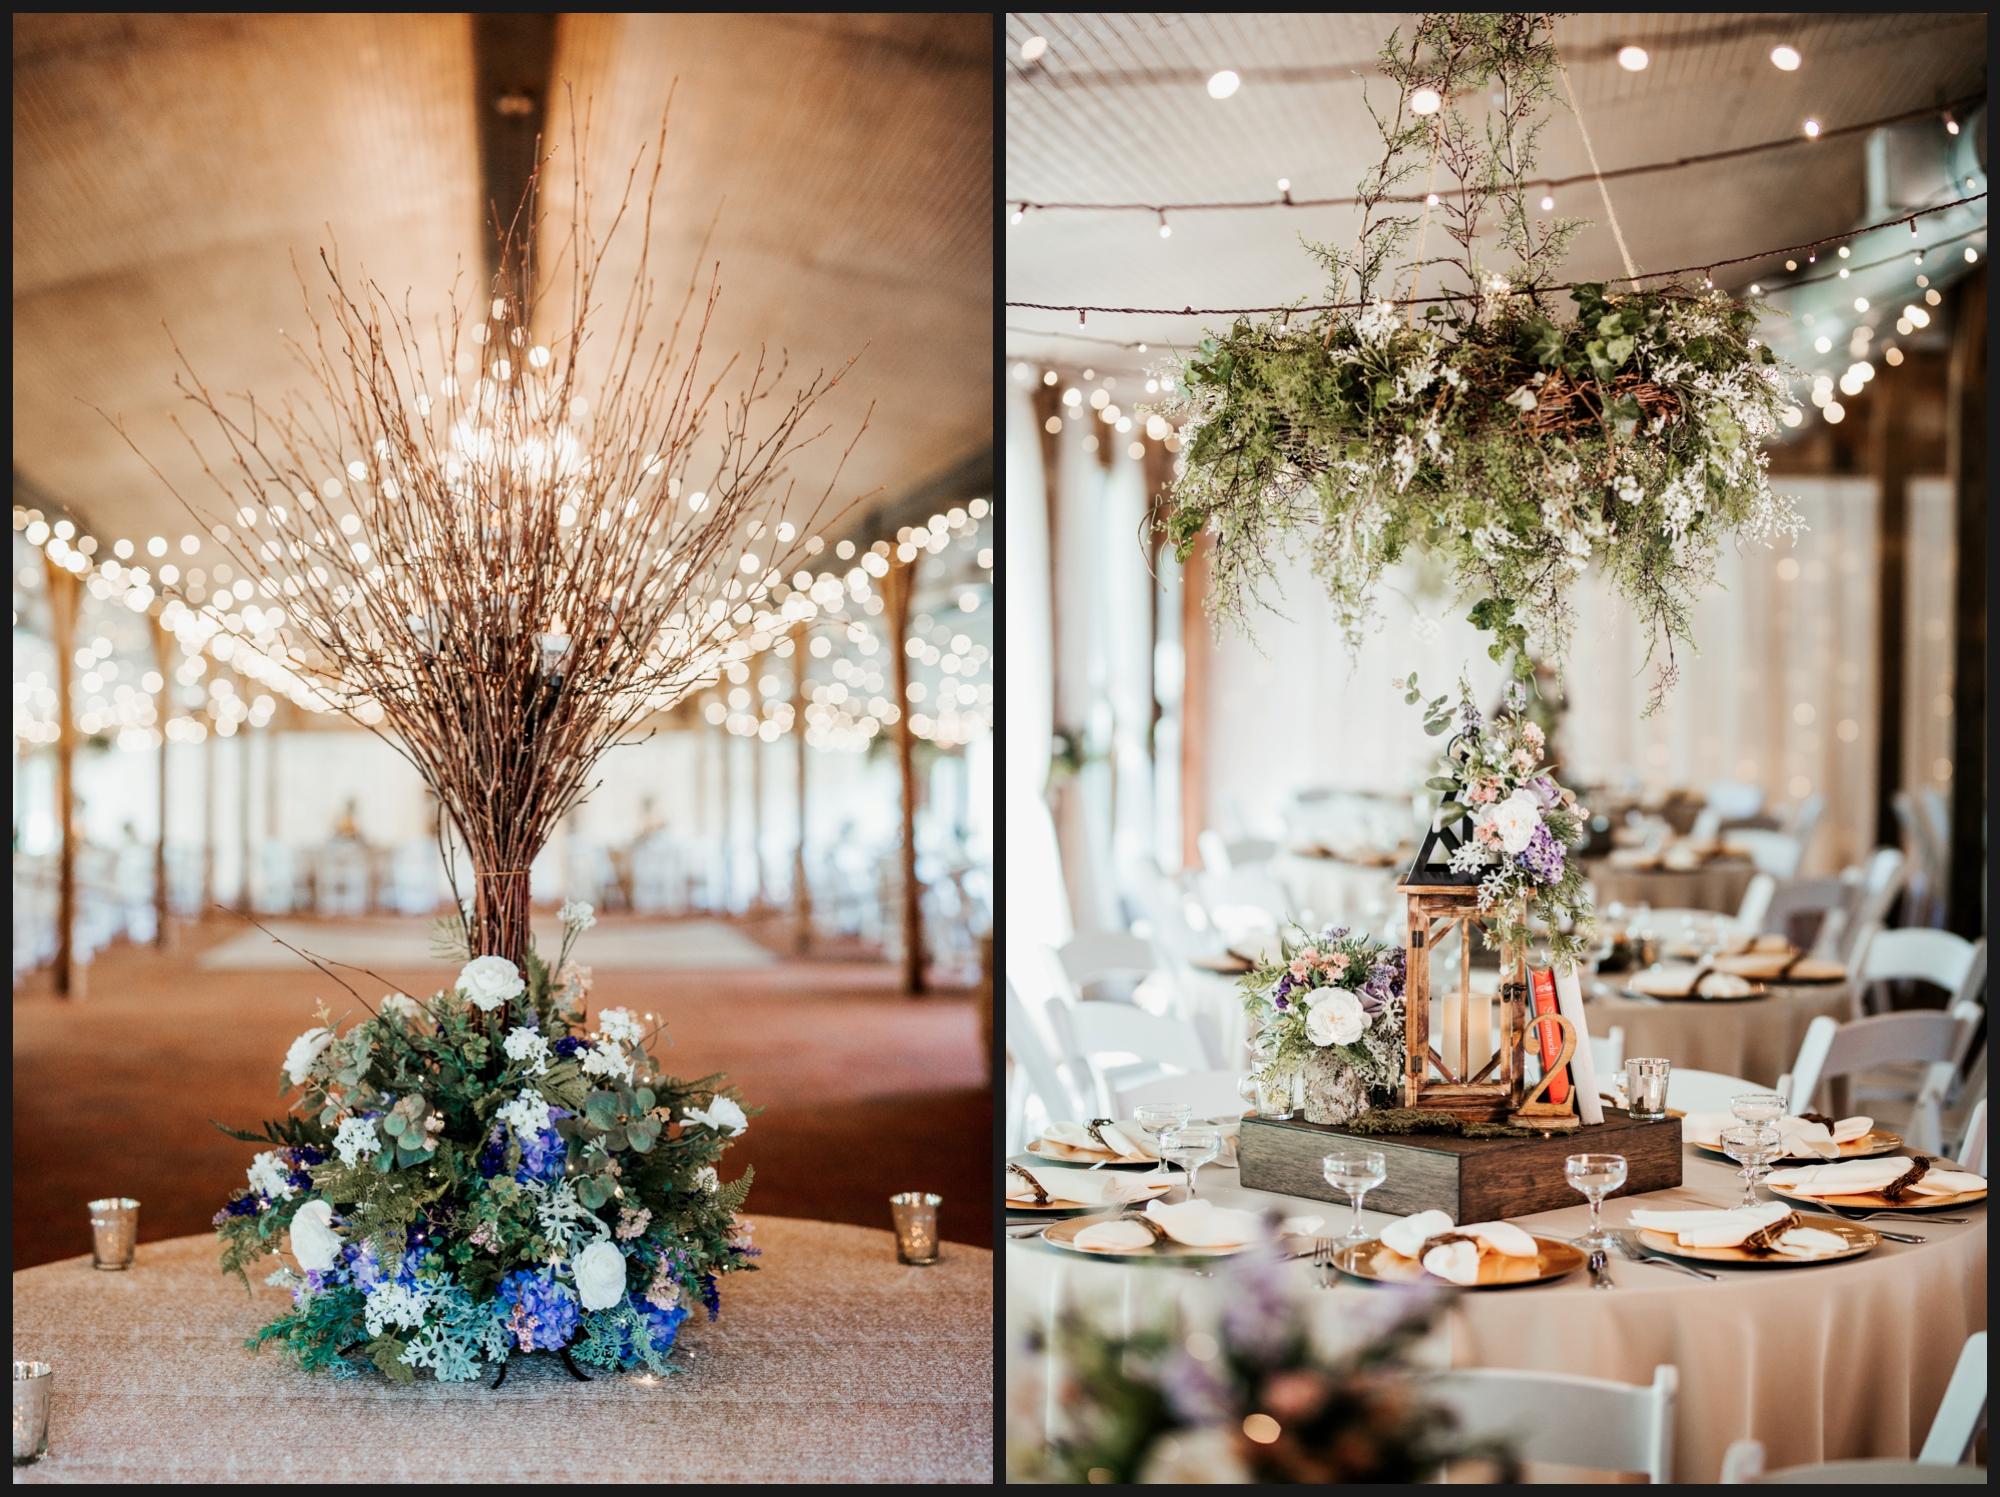 Orlando-Wedding-Photographer-destination-wedding-photographer-florida-wedding-photographer-bohemian-wedding-photographer_1567.jpg